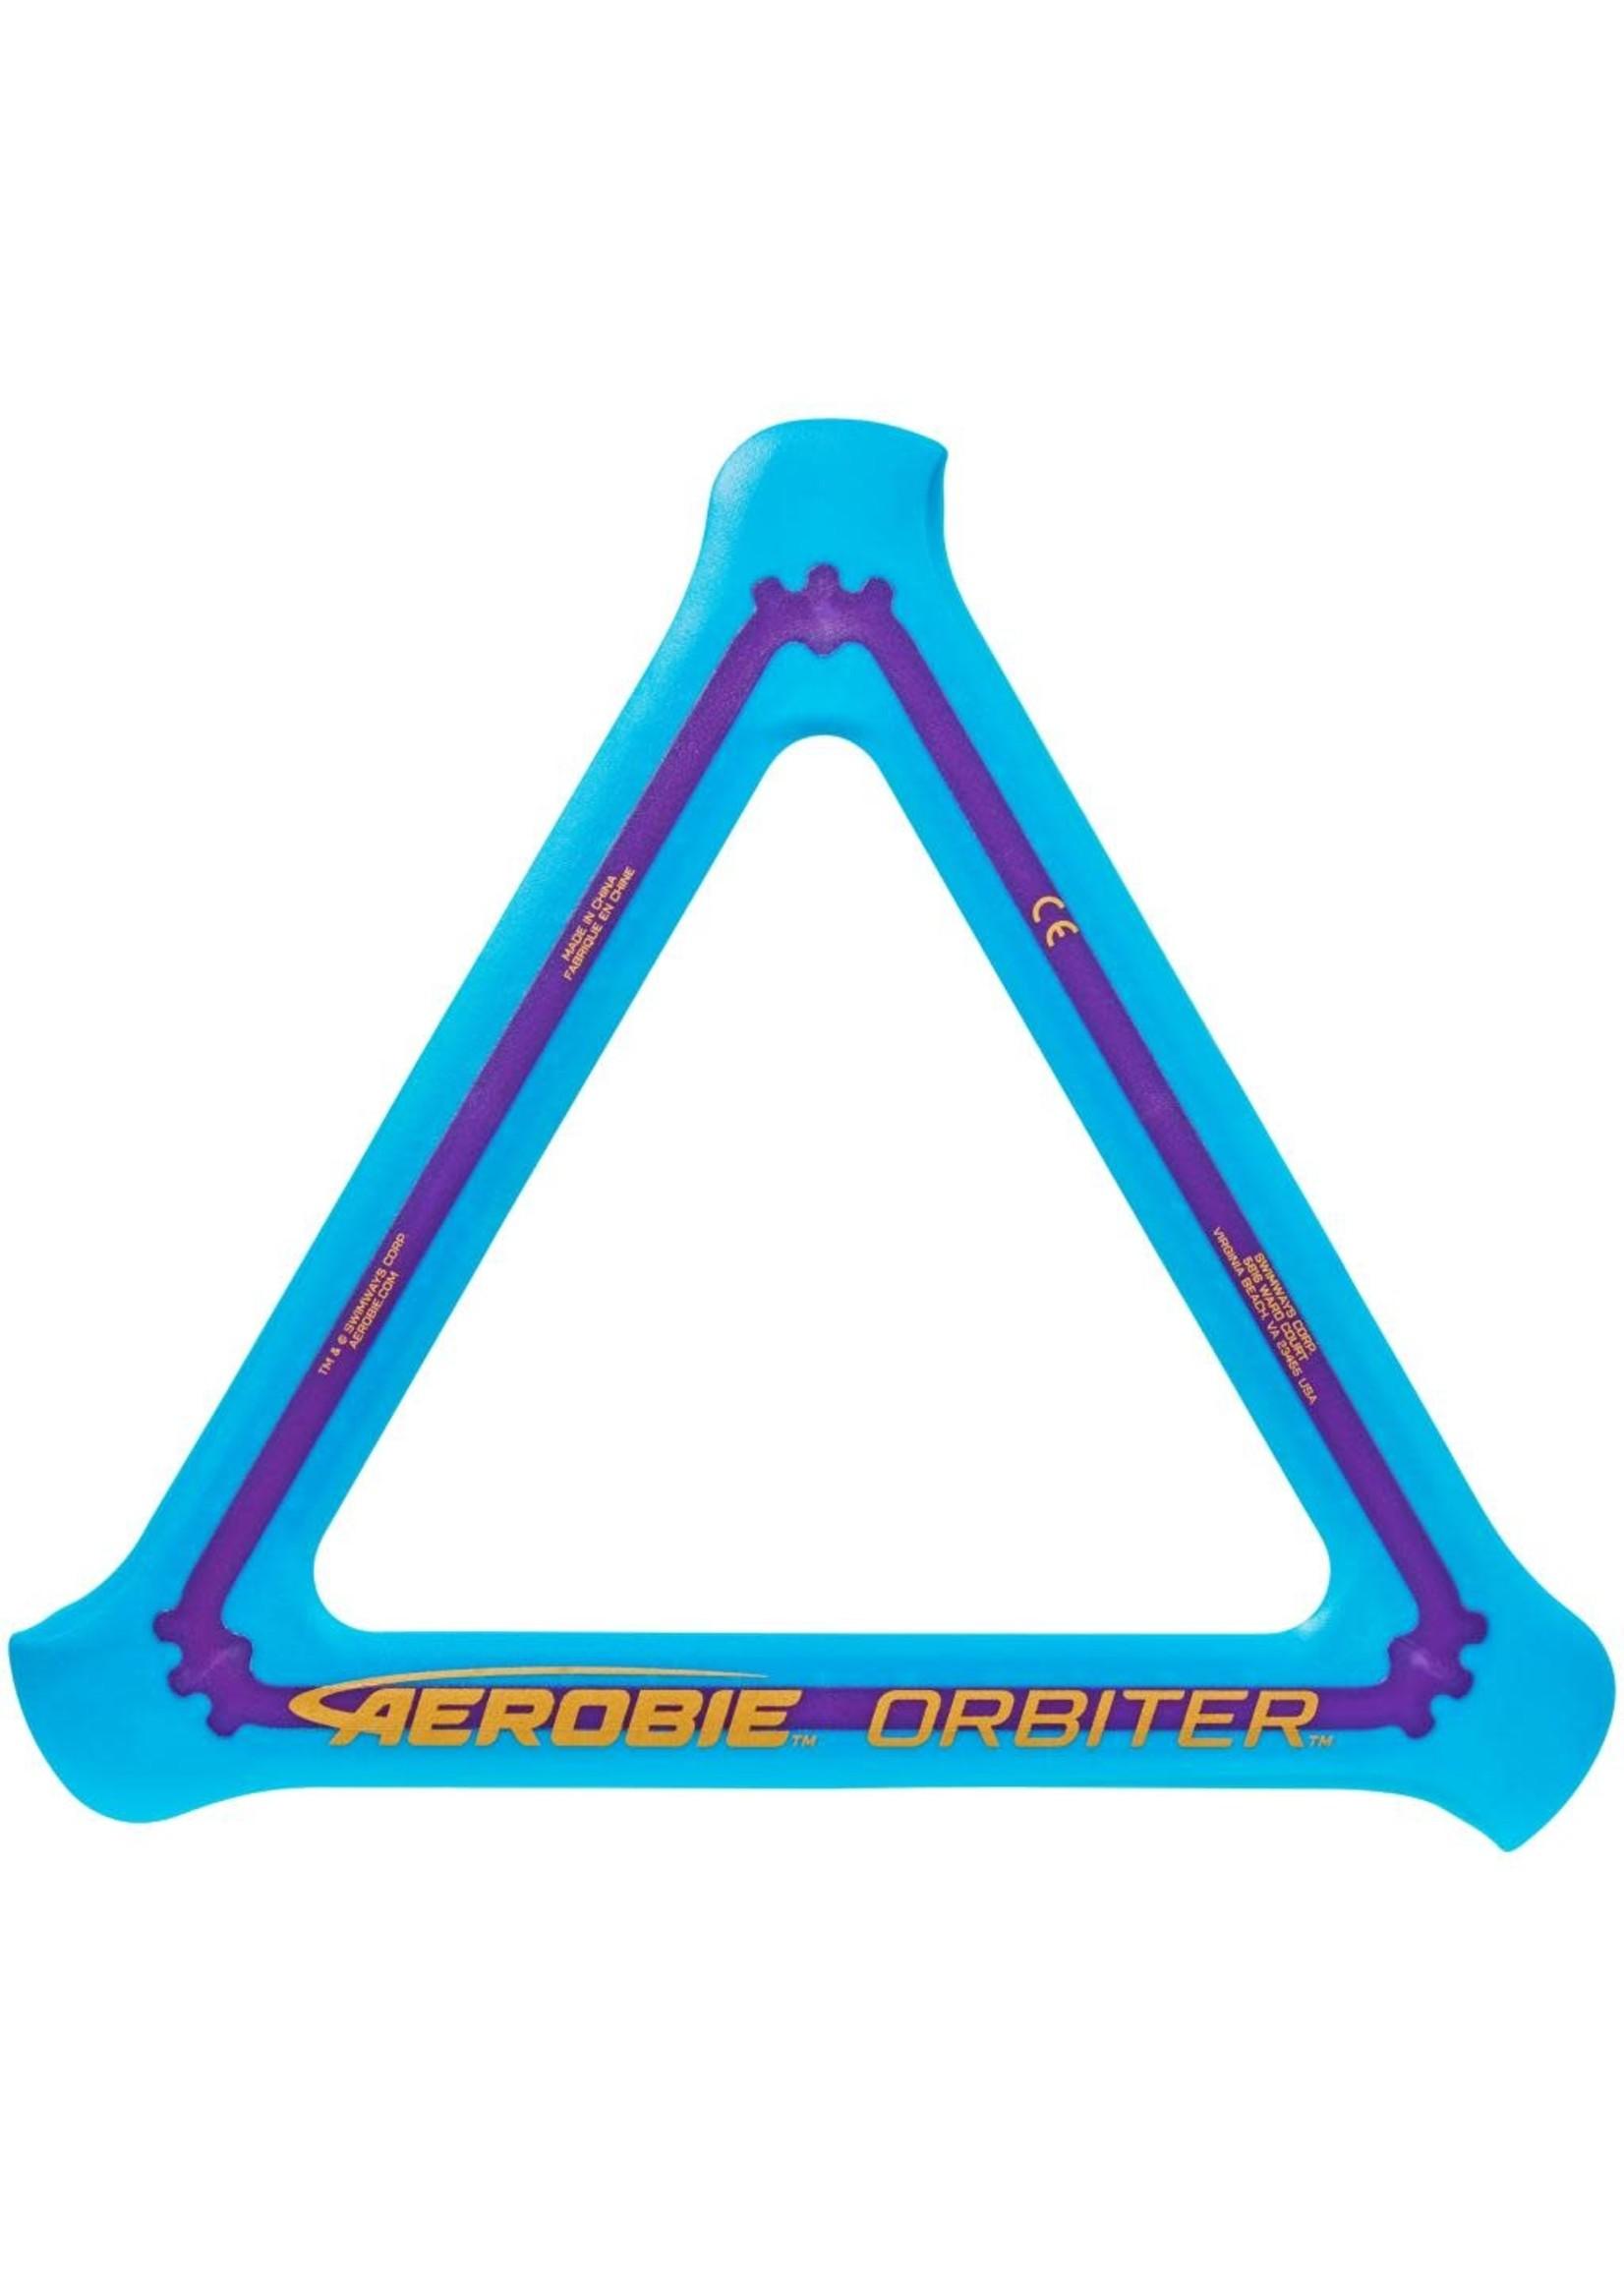 Aerobie Aerobie Orbiter Boomarang (2021)